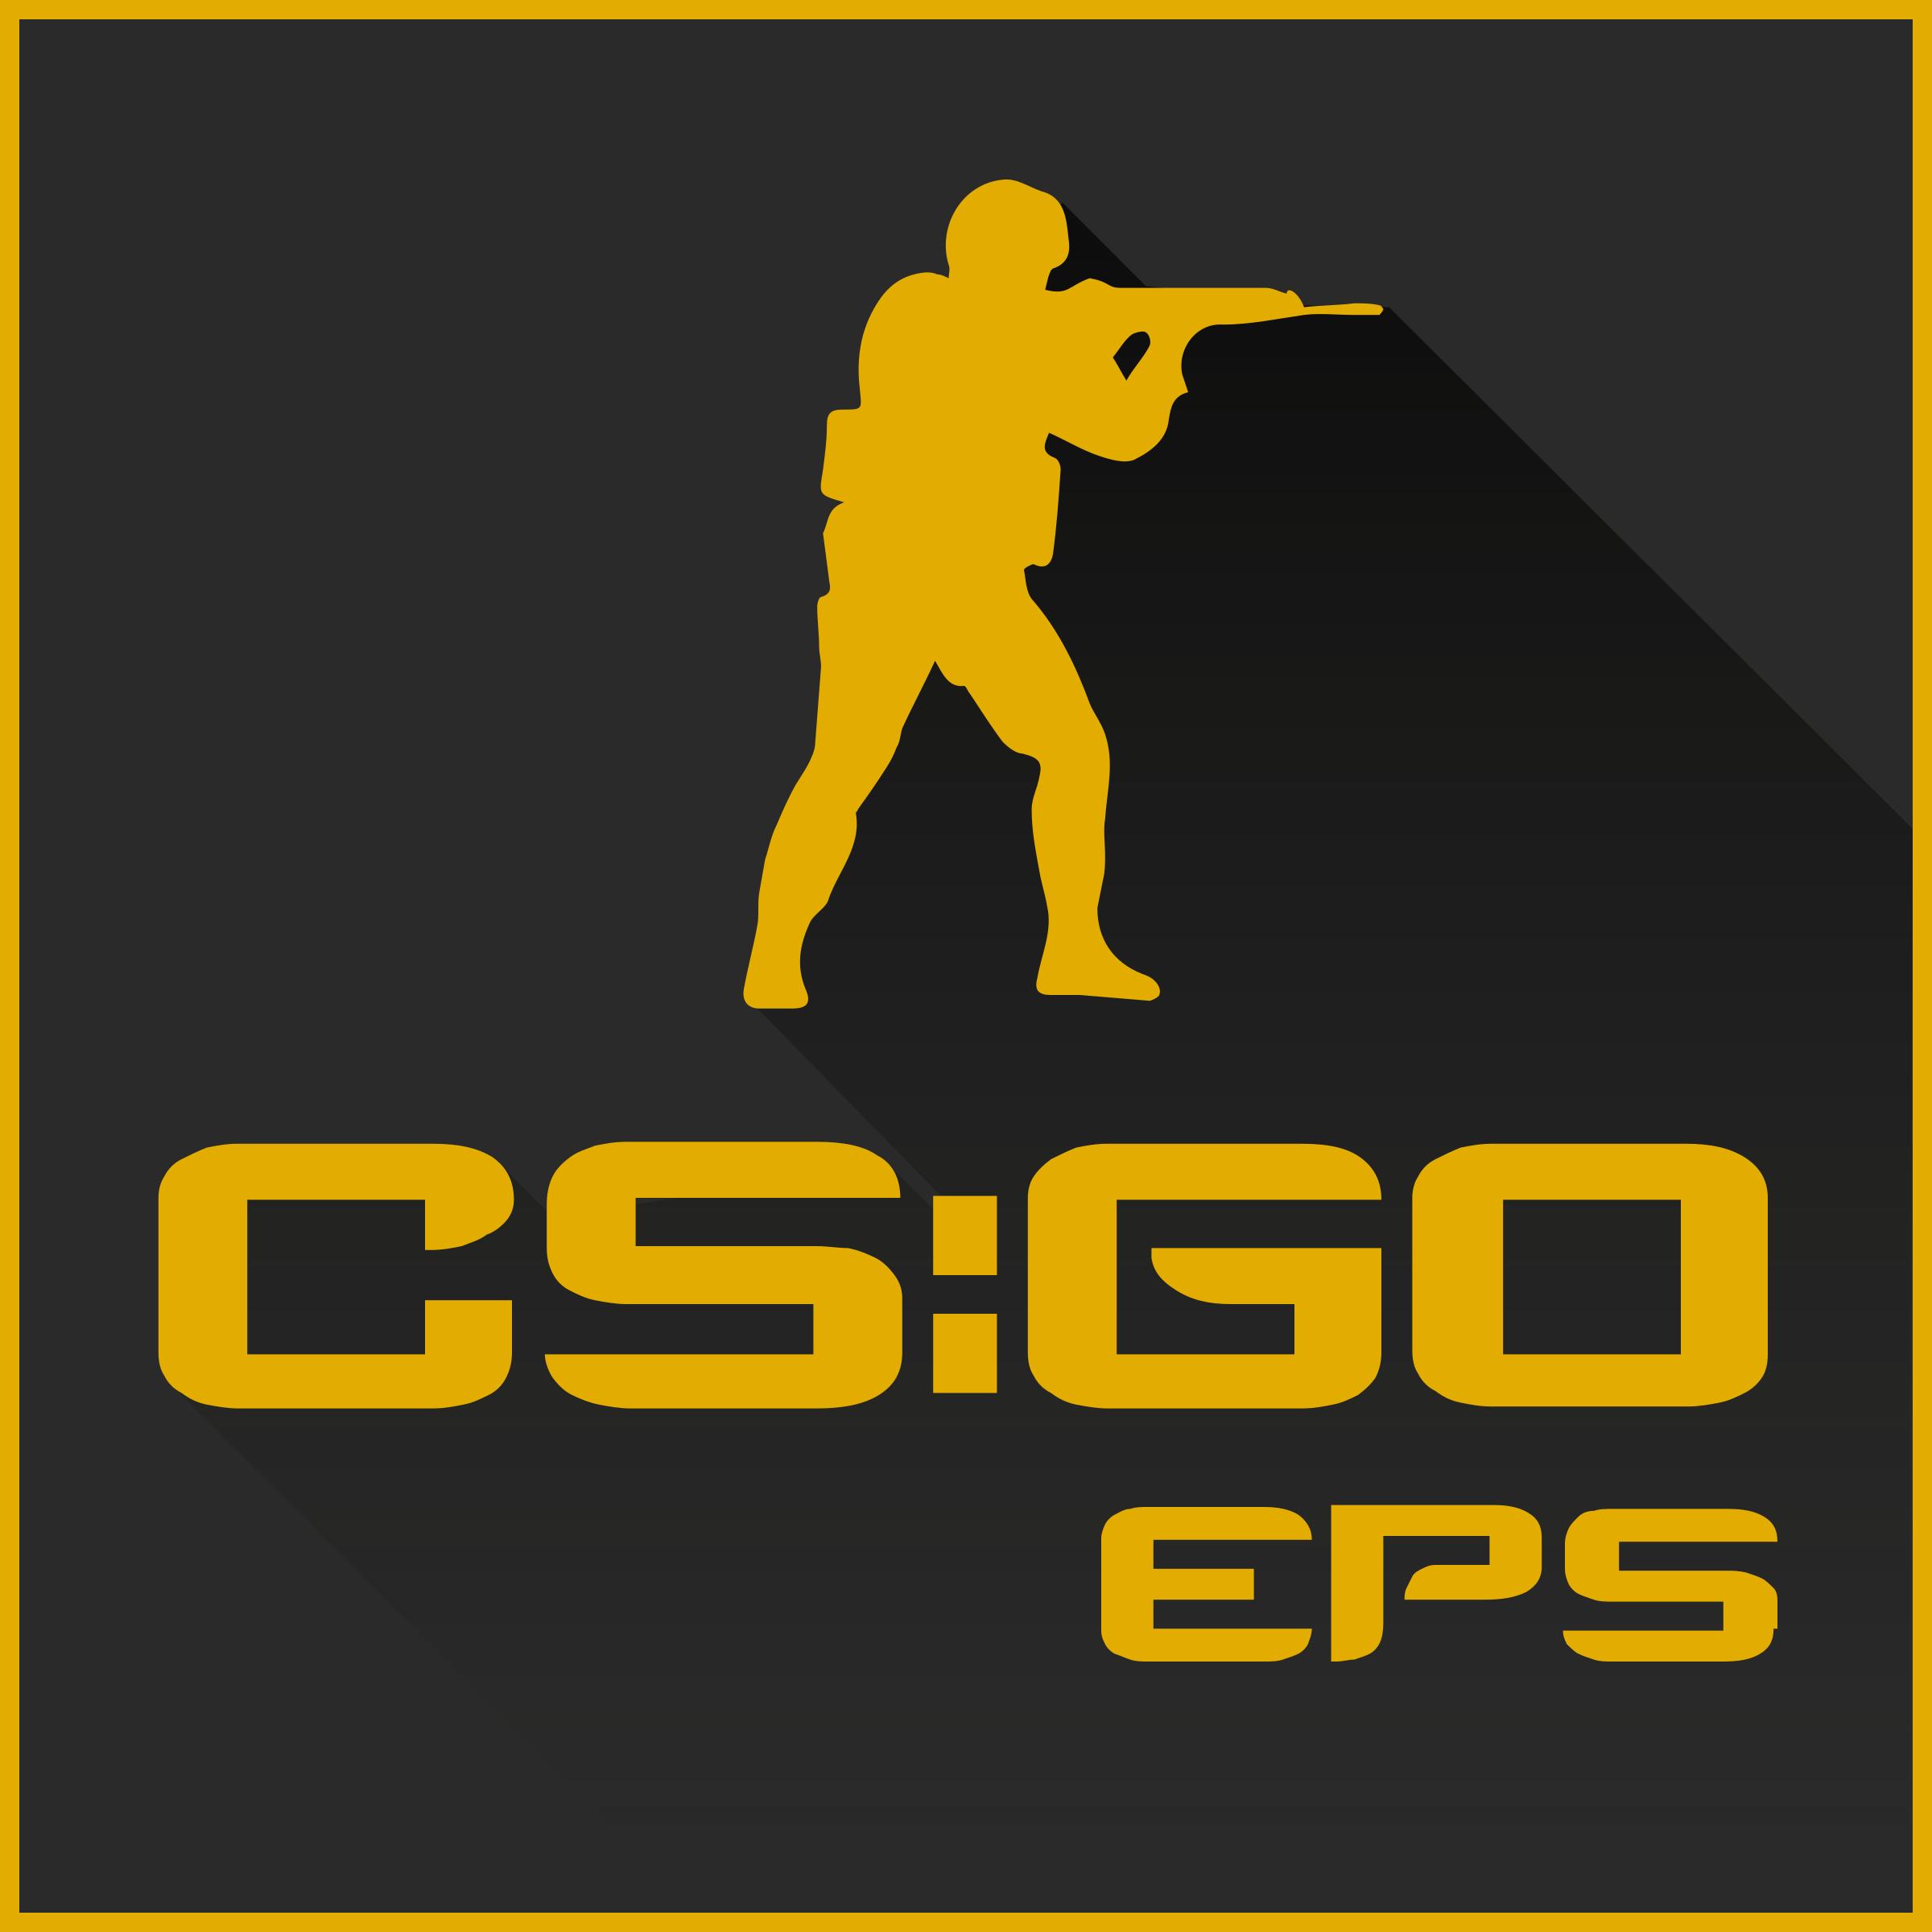 Counter Strike Global Offensive 3 Logo PNG Transparent & SVG Vector.